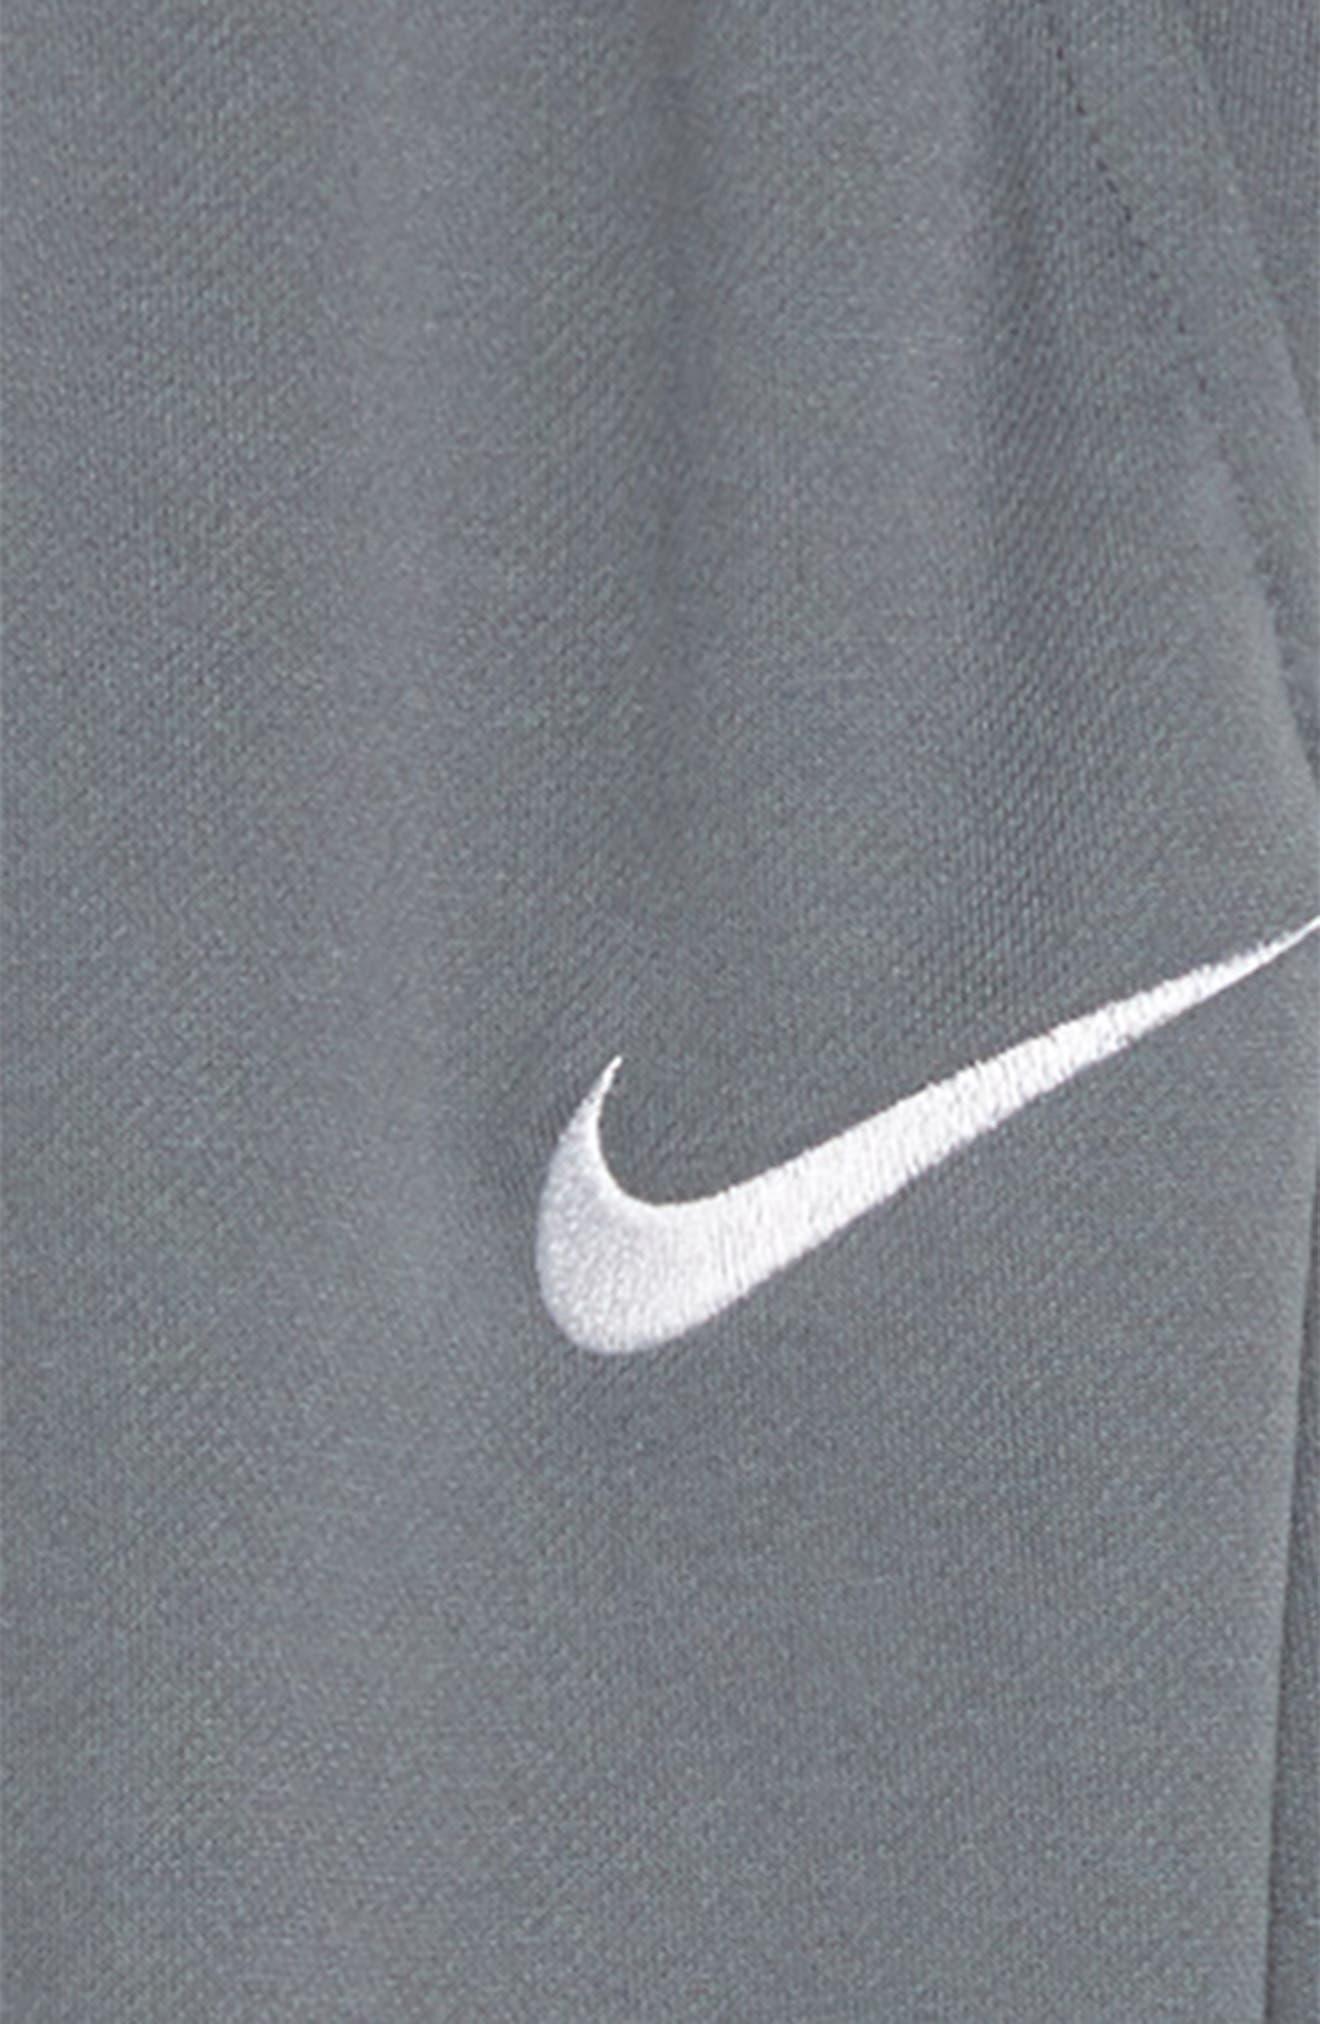 NIKE, Dry Fleece Training Pants, Alternate thumbnail 2, color, COOL GREY/ WHITE